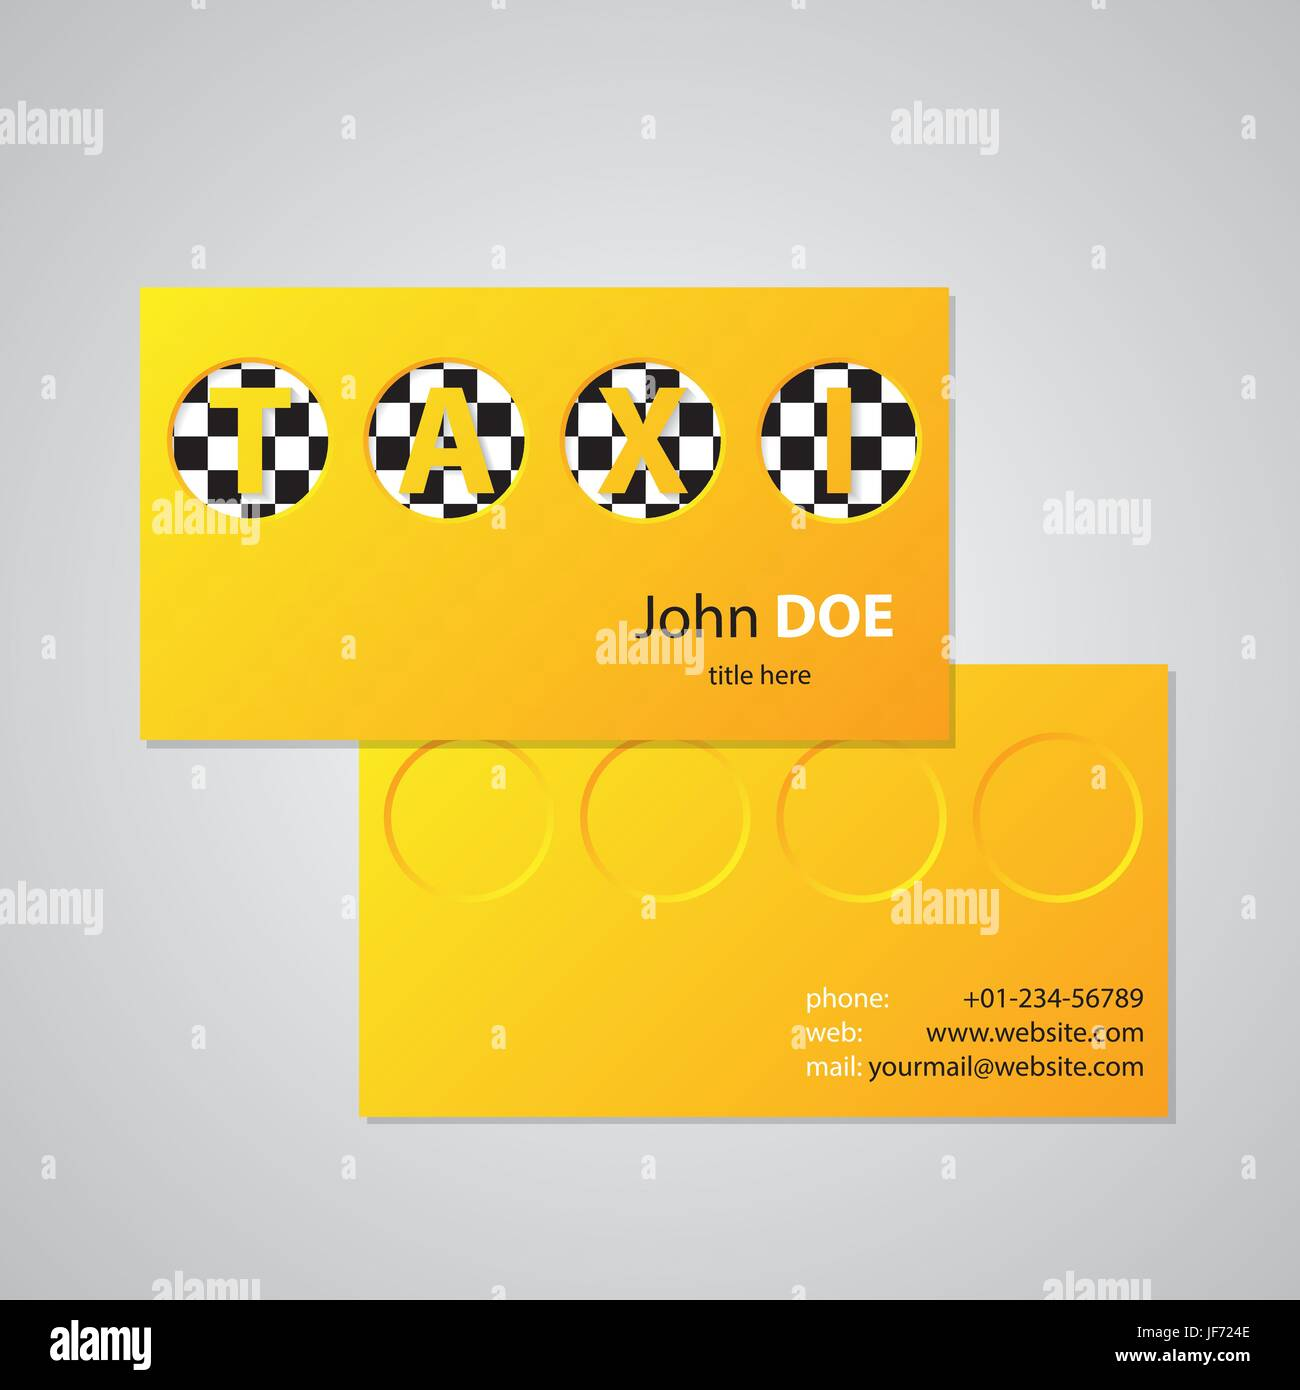 Taxi business card design with cutout taxi text Stock Vector Art ...